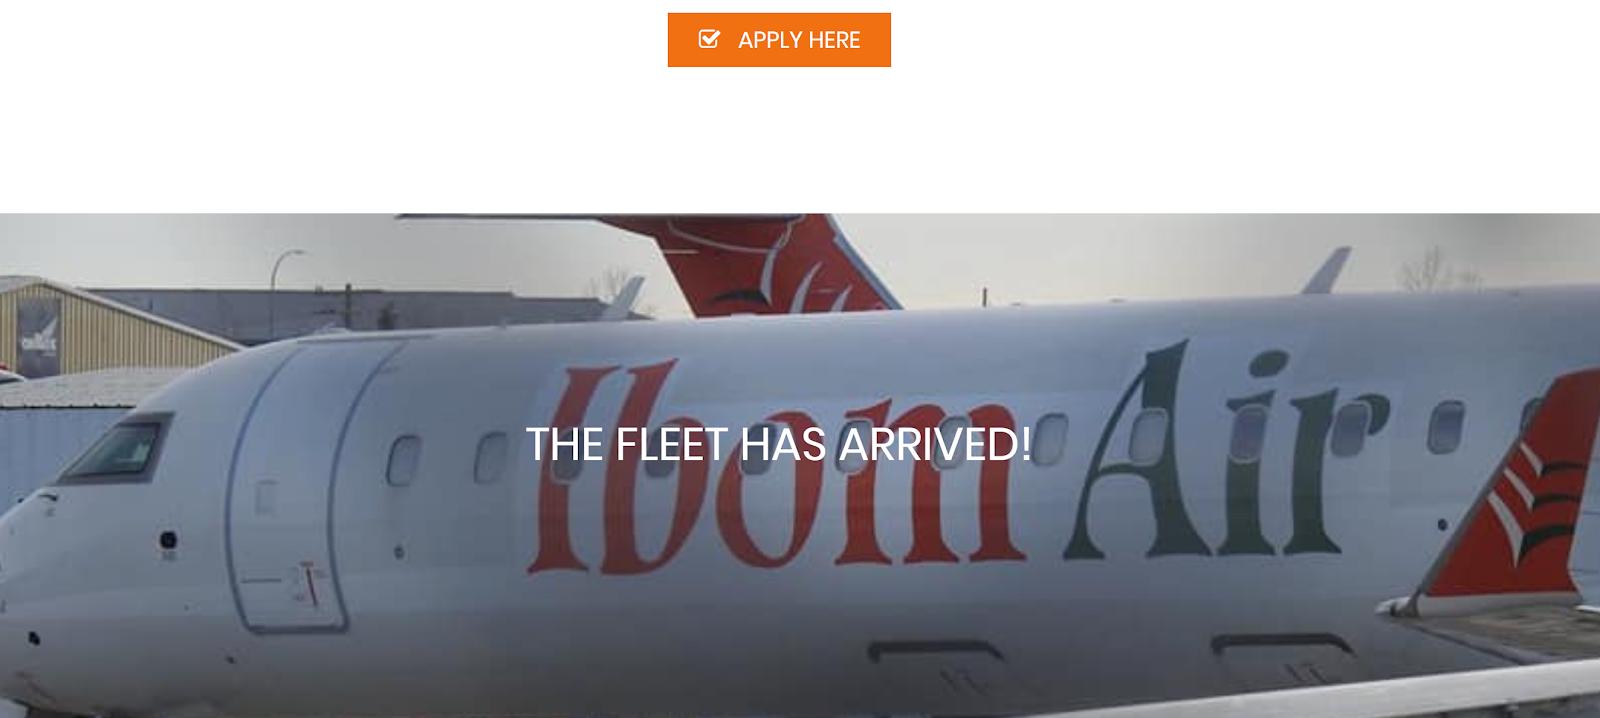 Ibom Air Jobportal